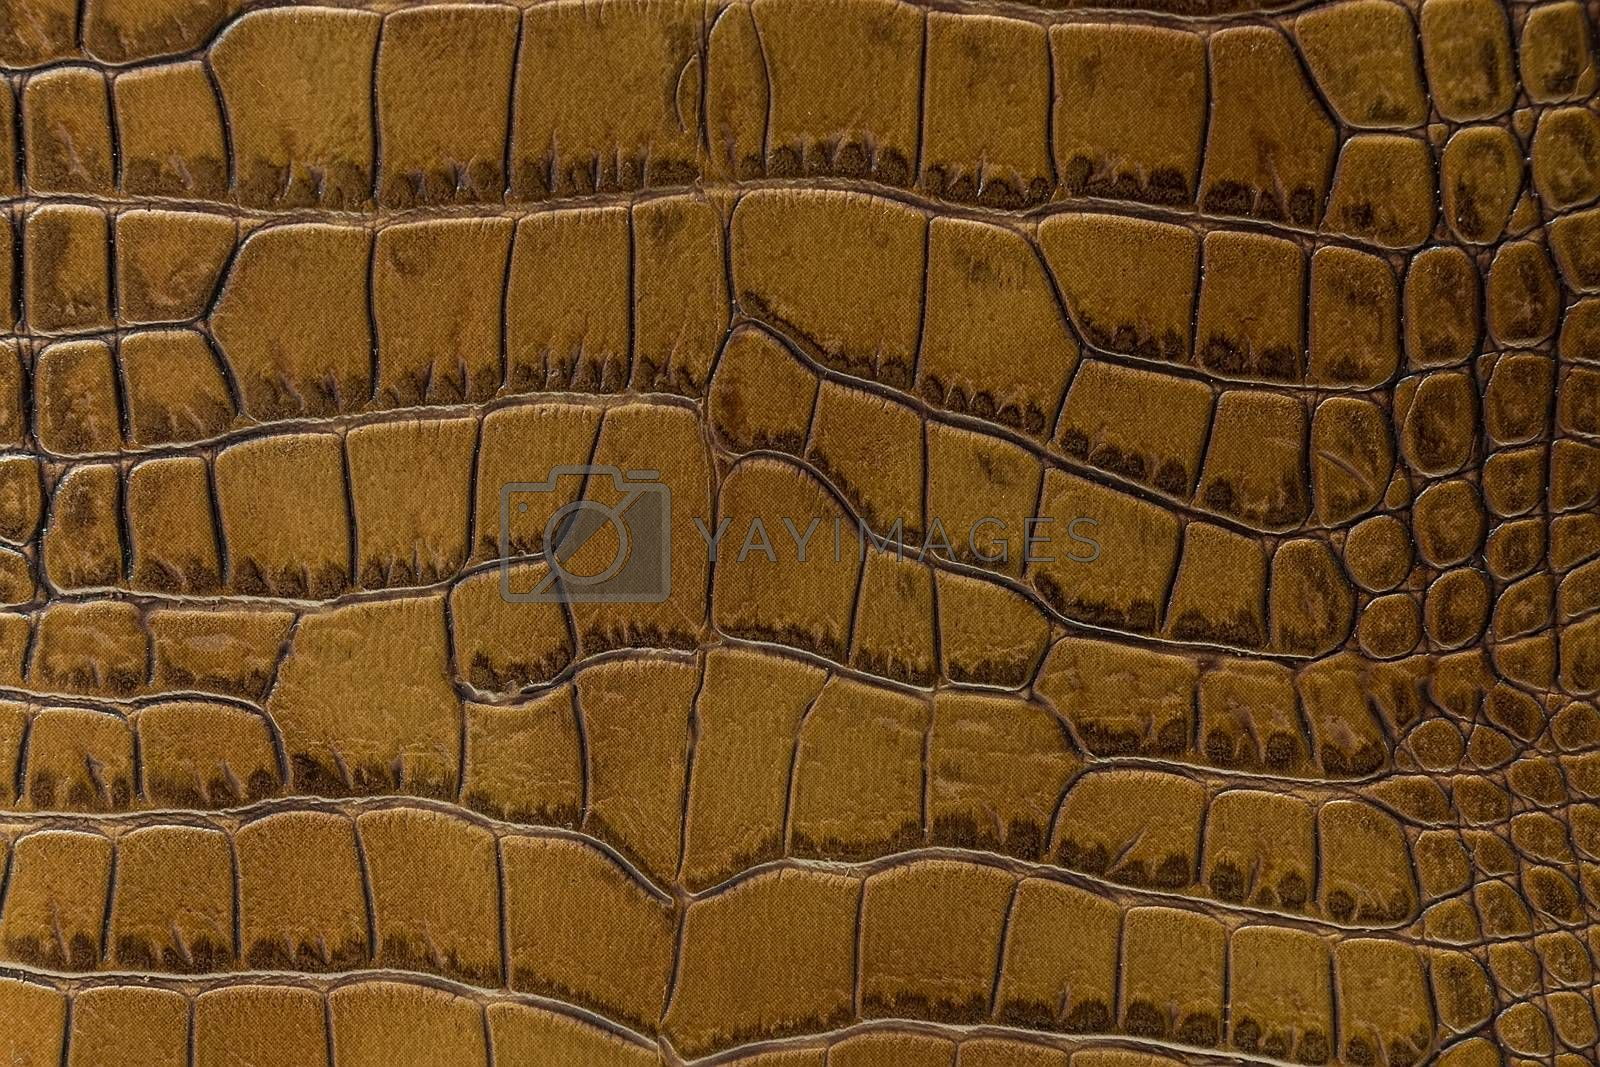 texture of the skin yellow, studio, subject survey